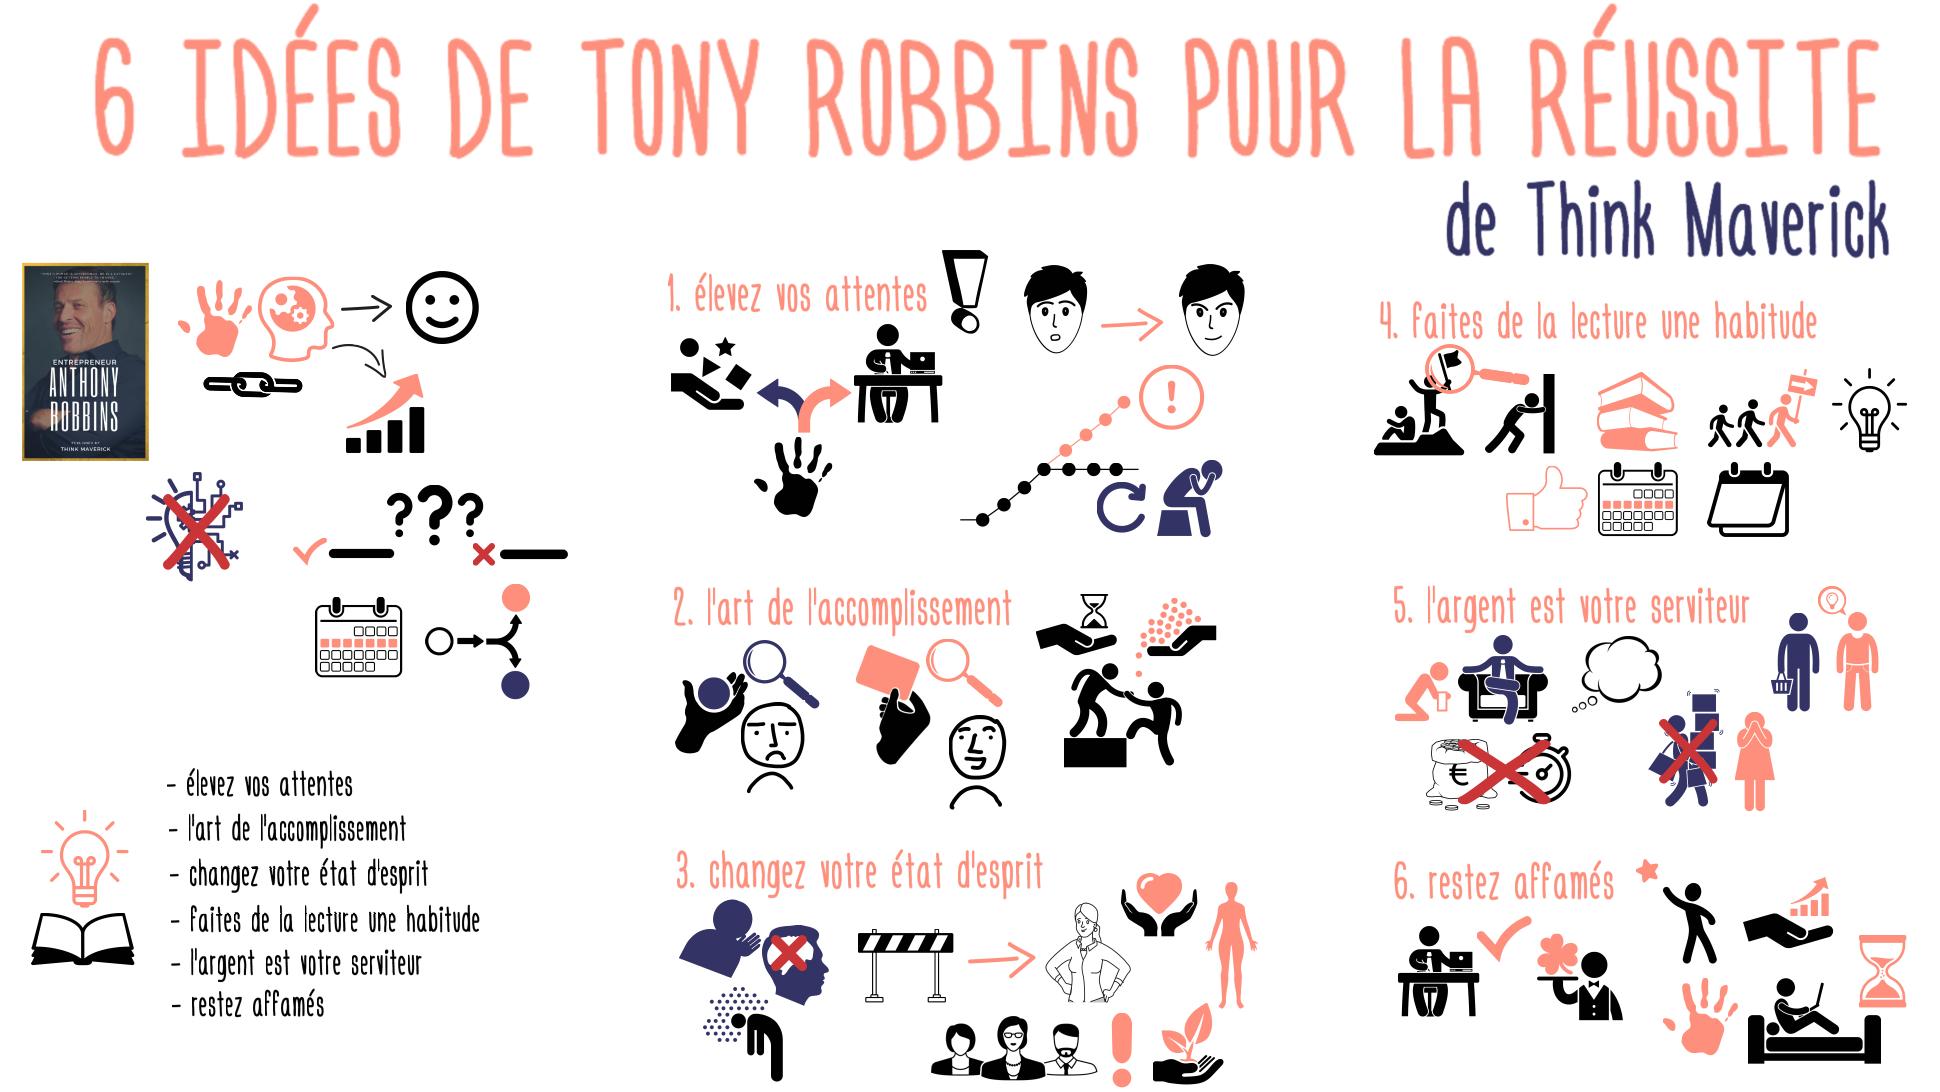 TonyRobbinsReussite